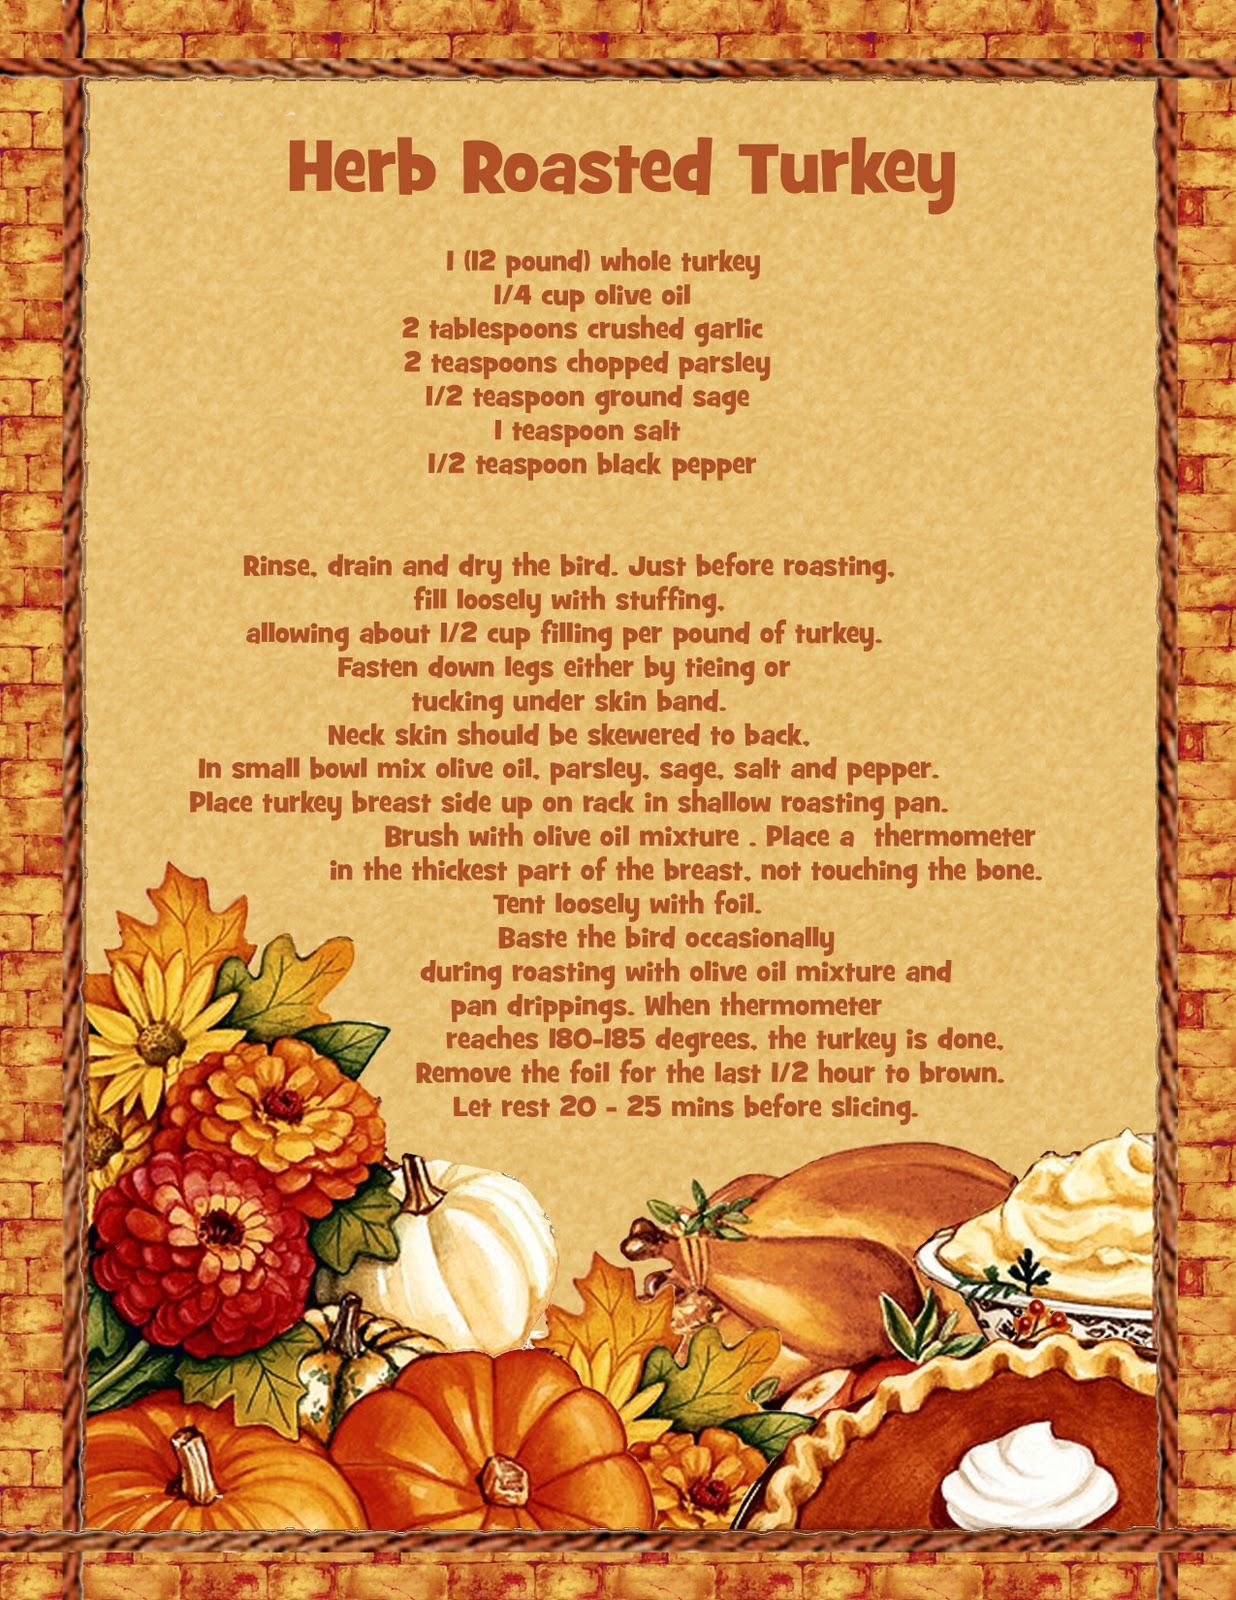 Grammas cookbook: Herb RoastedTurkey